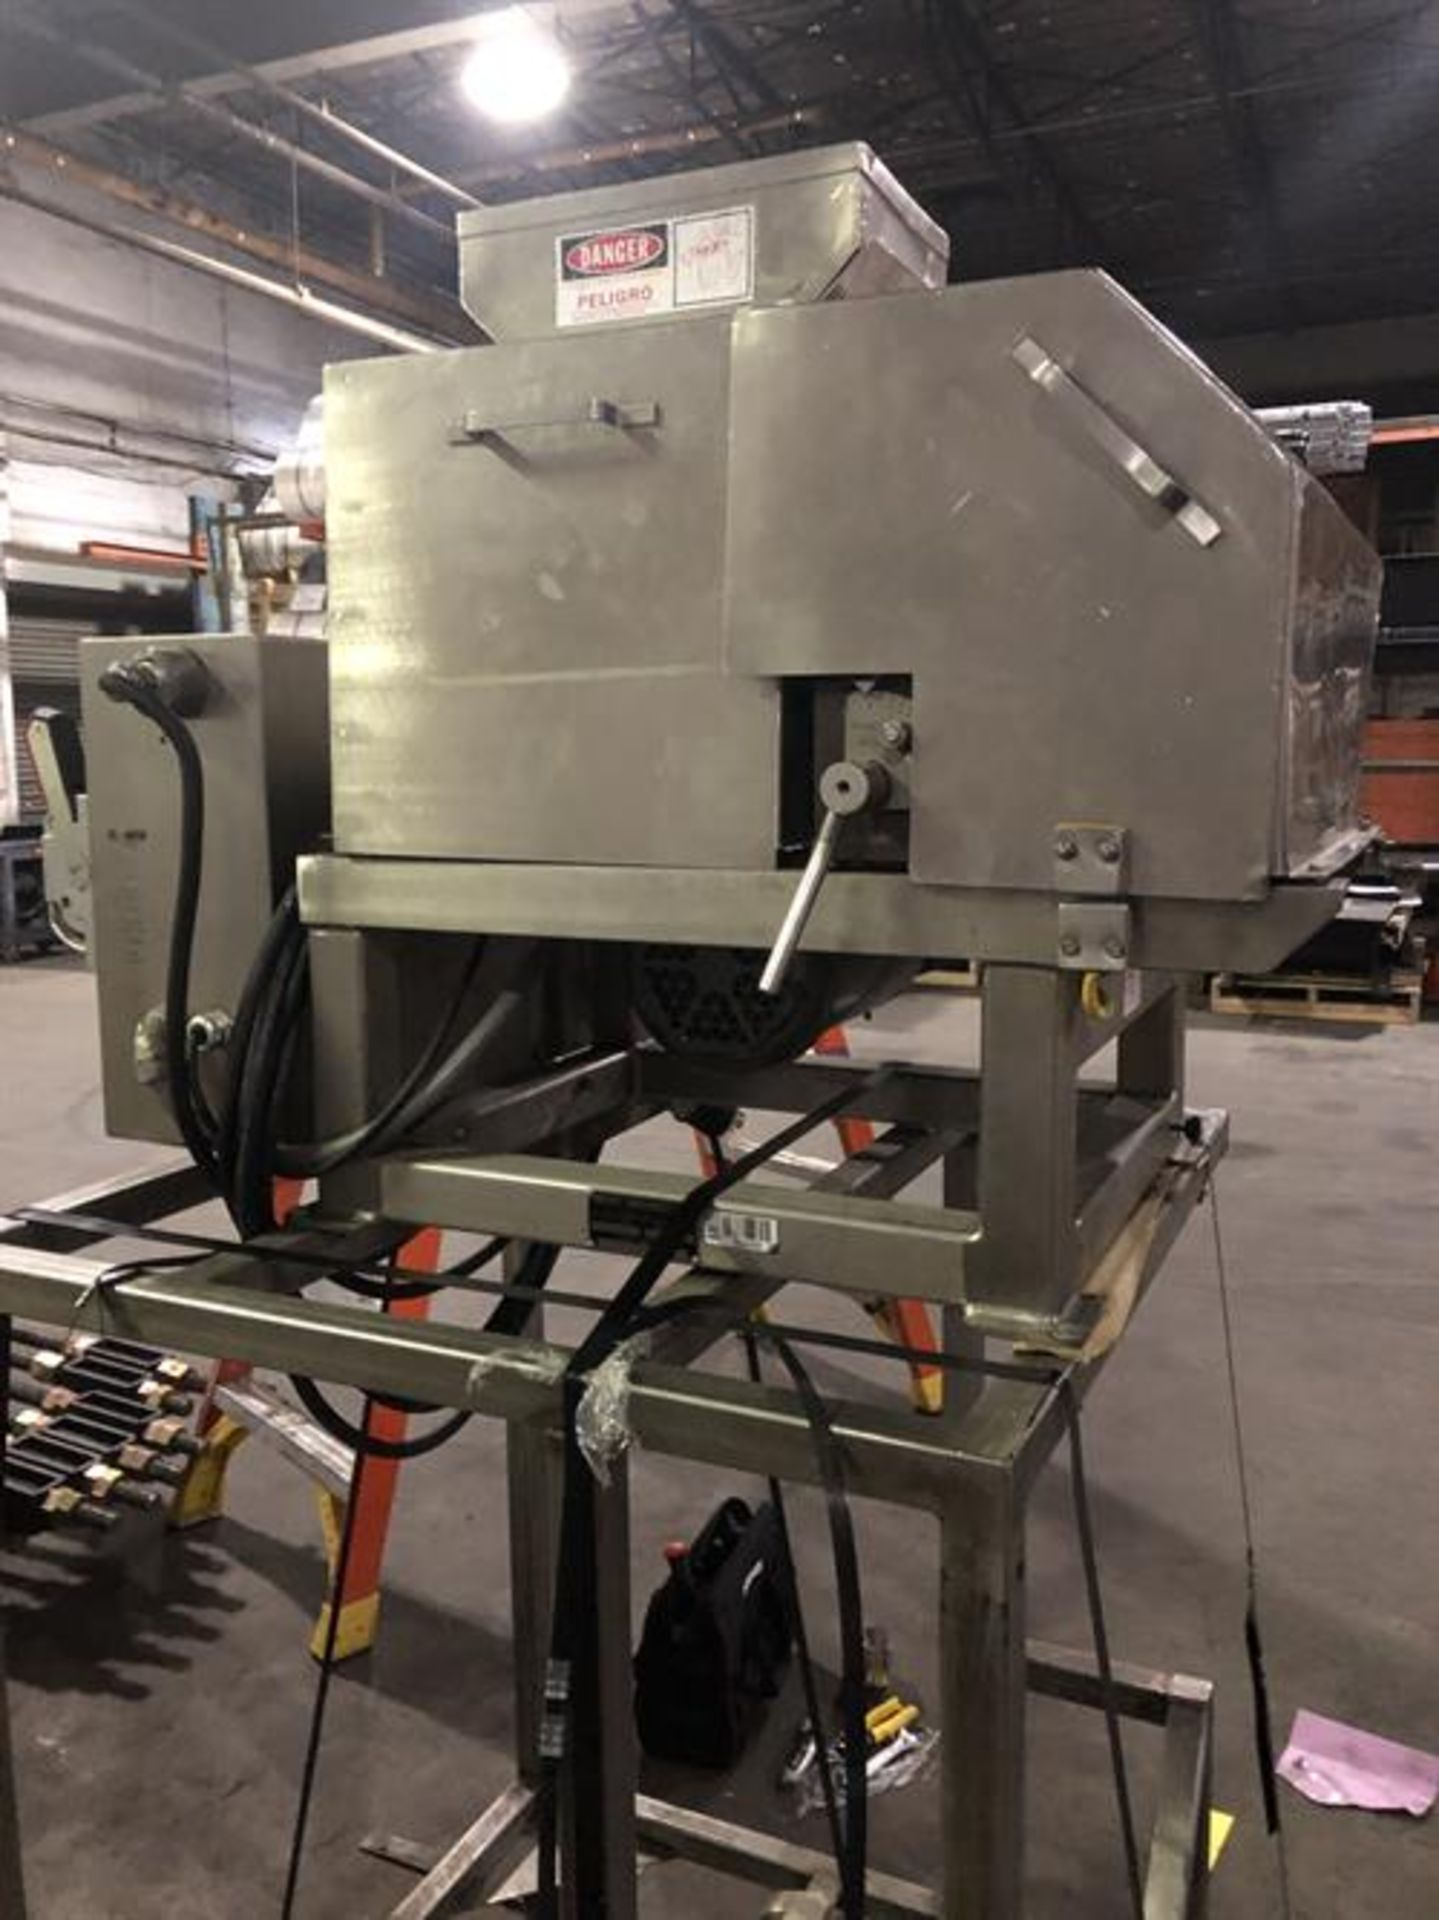 Urschel model N Stainless Steel Granulator - Vibrator pan feeder with variable speed rheostat - - Image 14 of 18